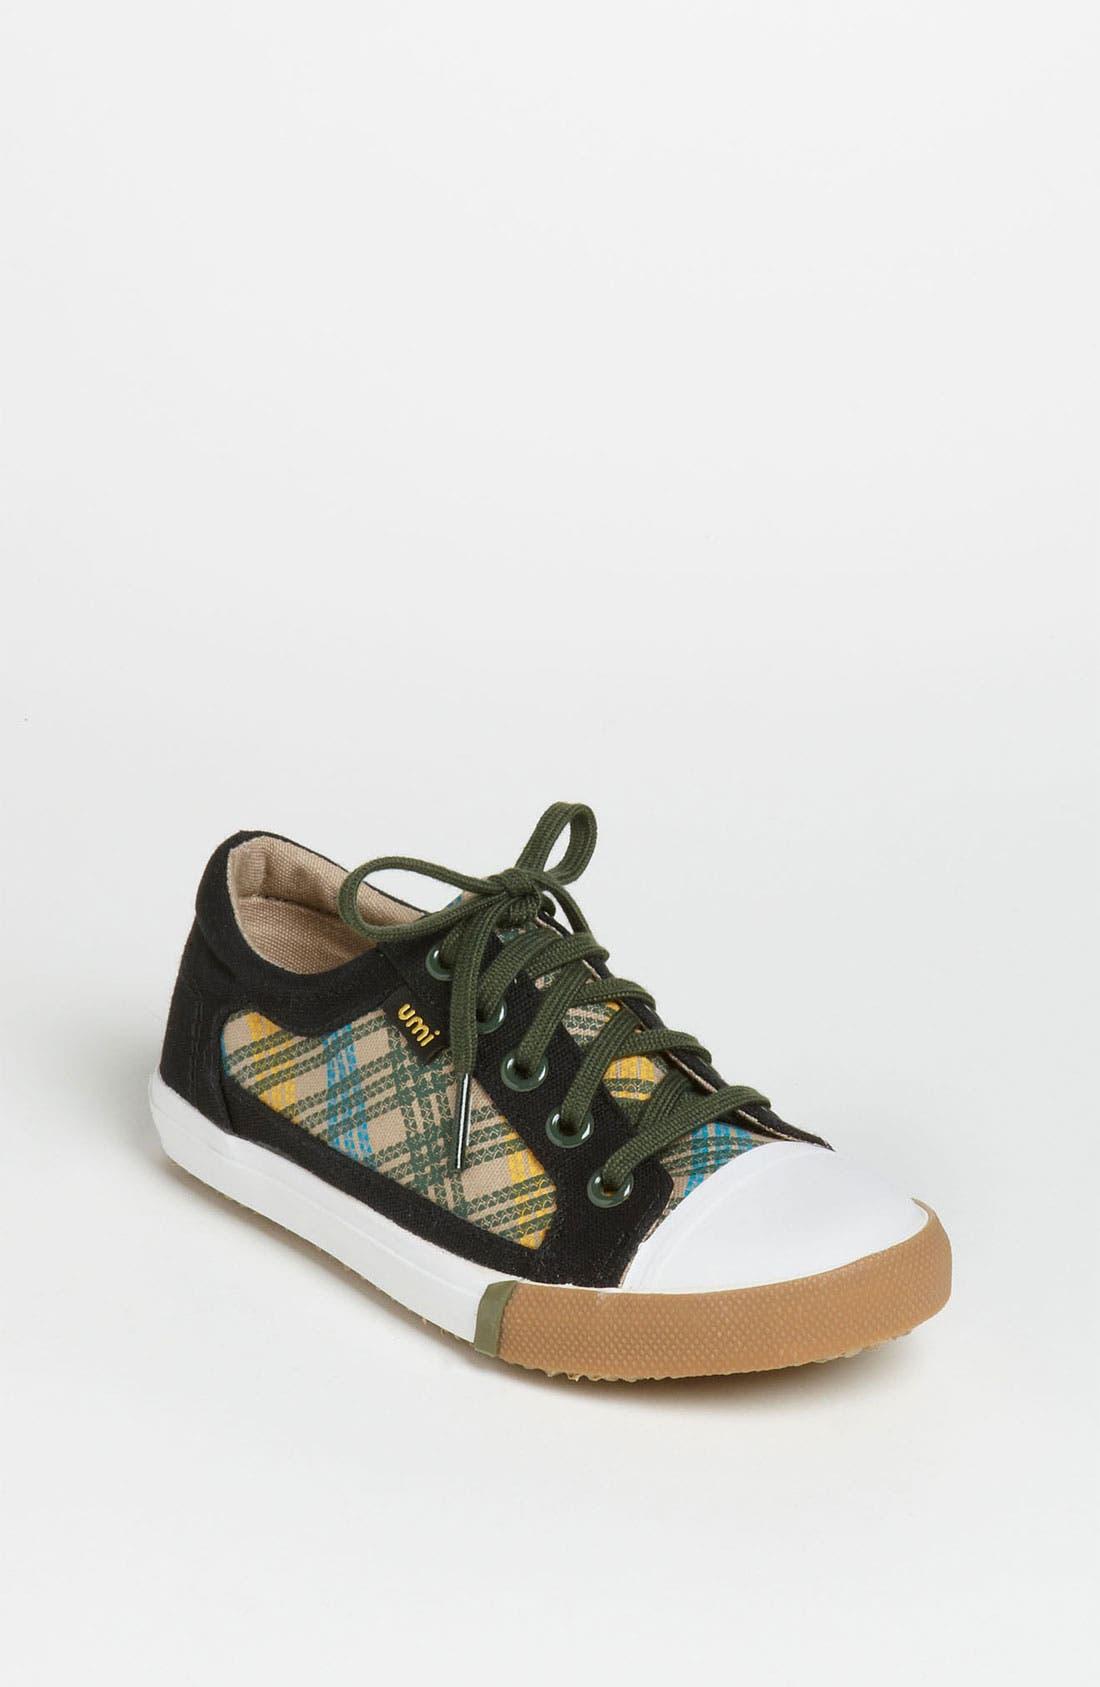 Alternate Image 1 Selected - Umi 'Dann' Sneaker (Toddler, Little Kid & Big Kid)